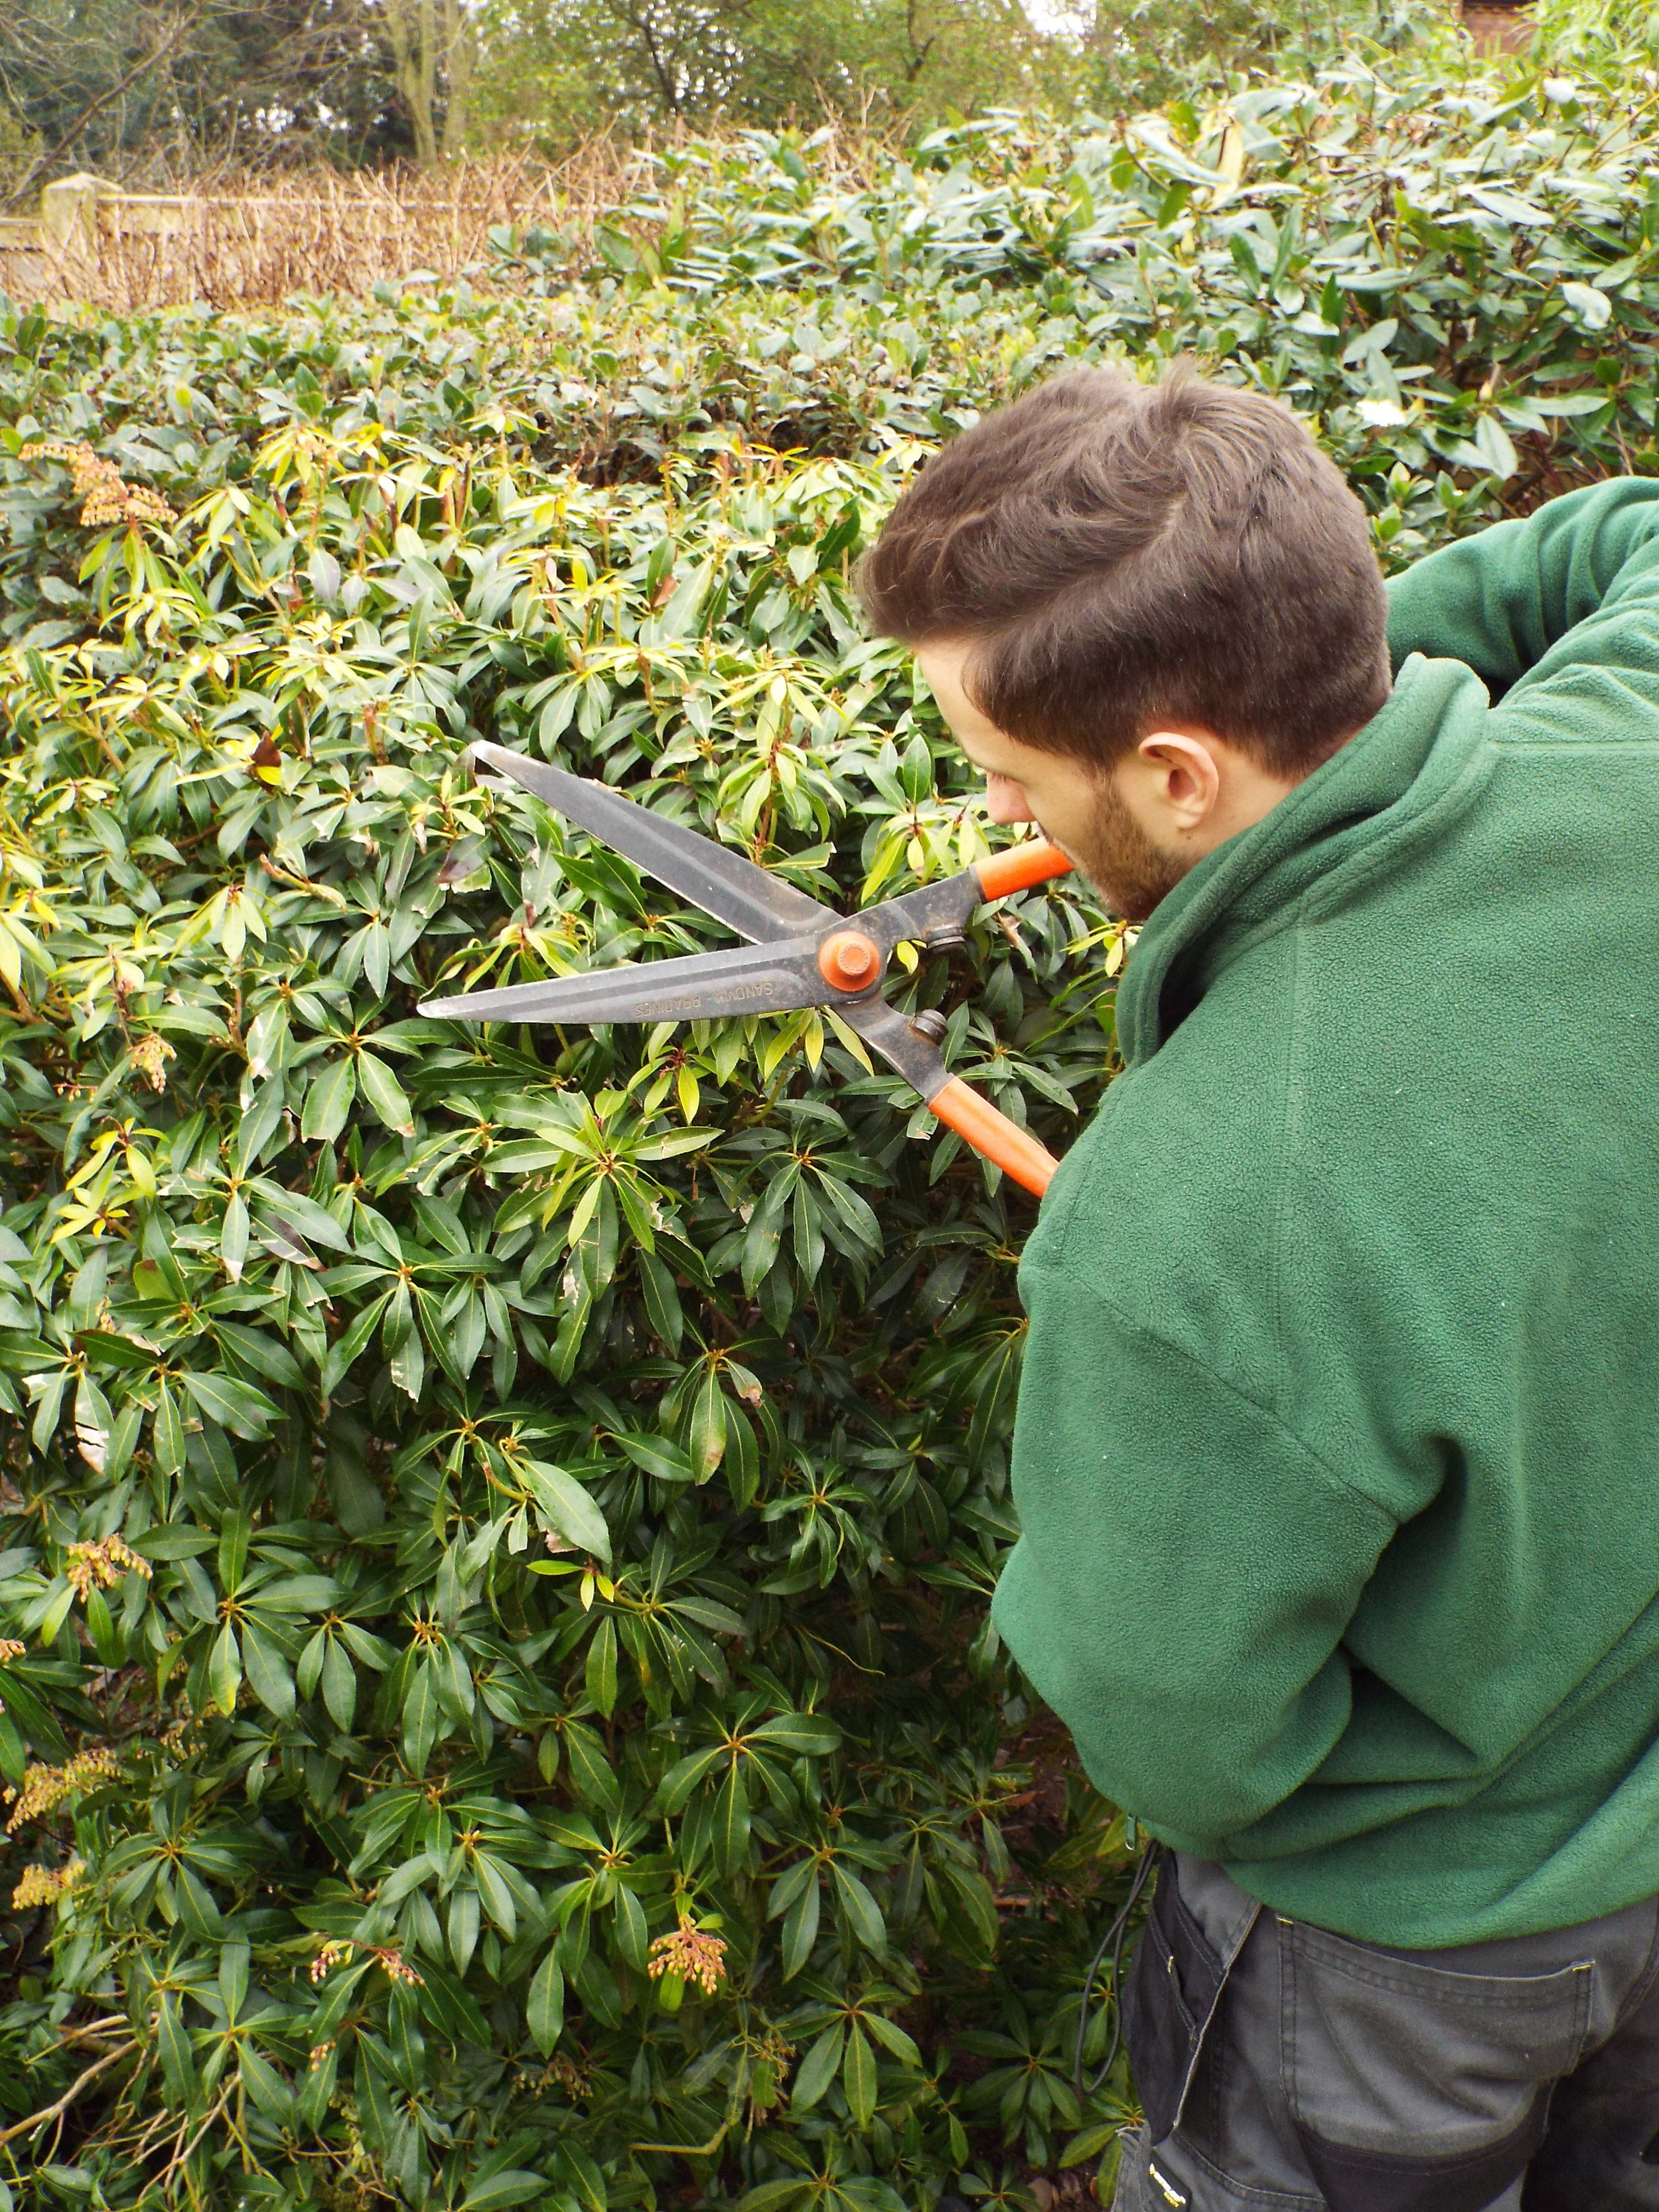 Man trimming a garden hedge